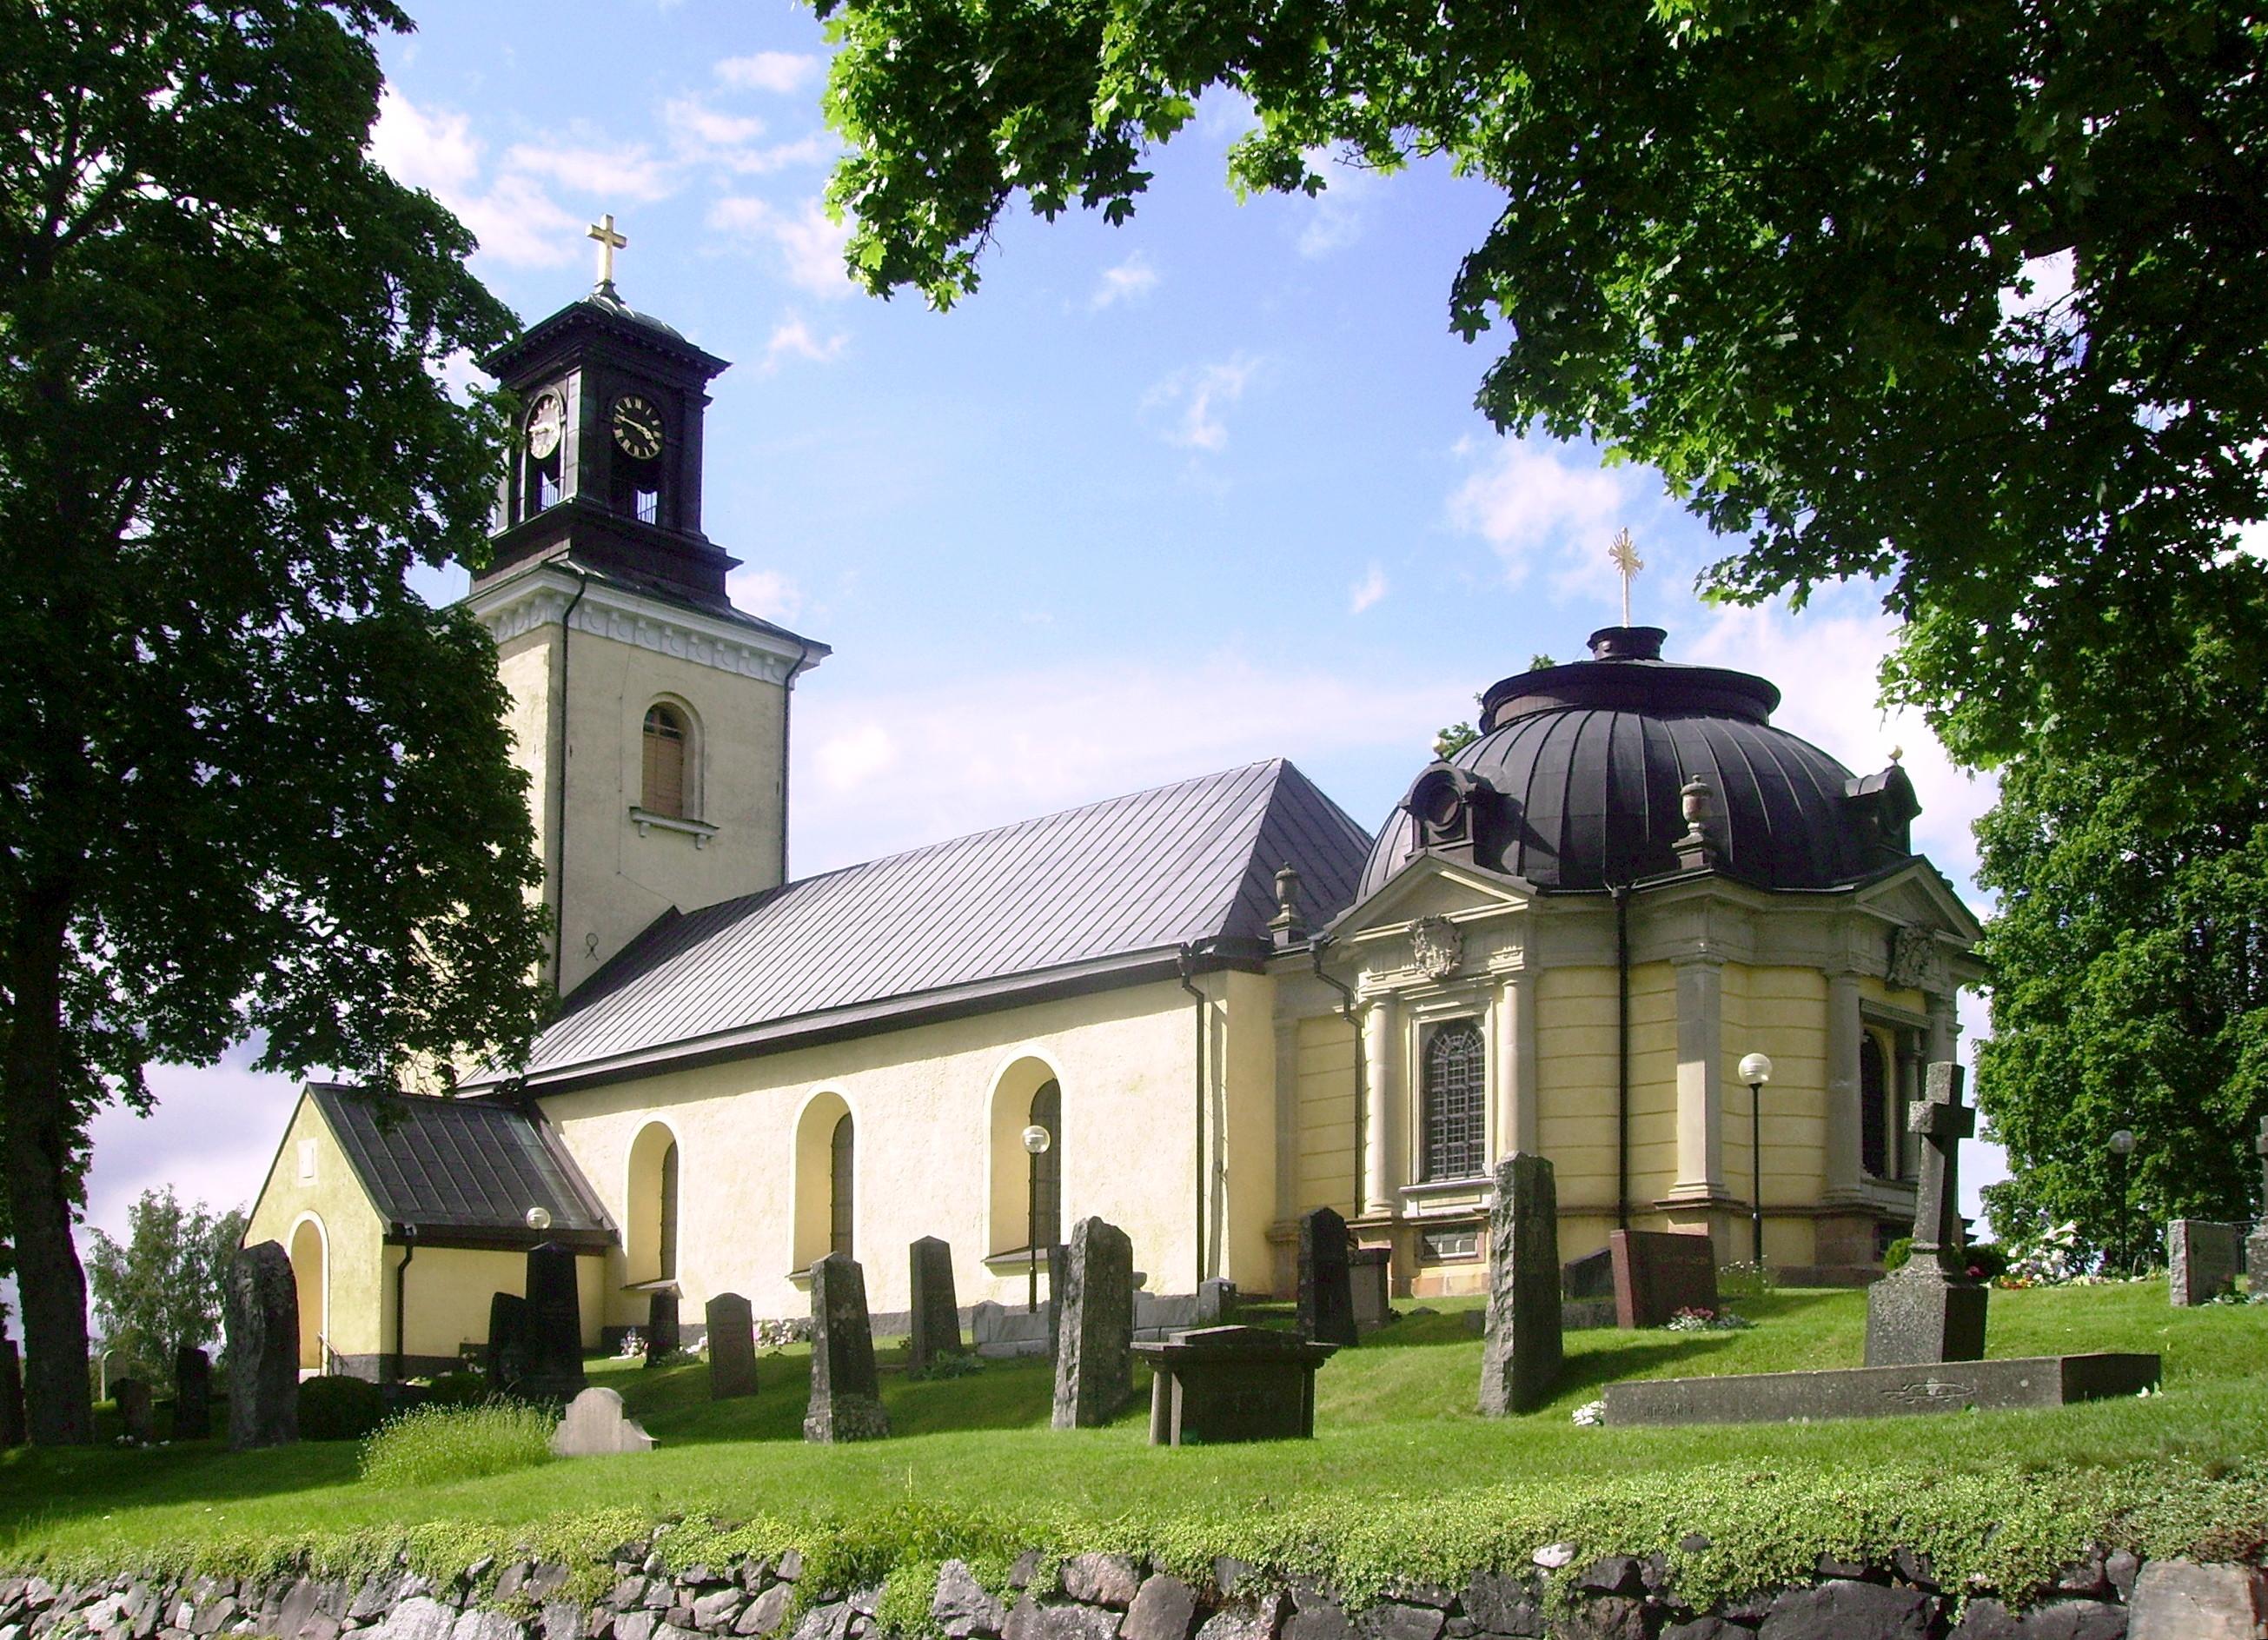 Turinge-Taxinge frsamling - Svenska kyrkan